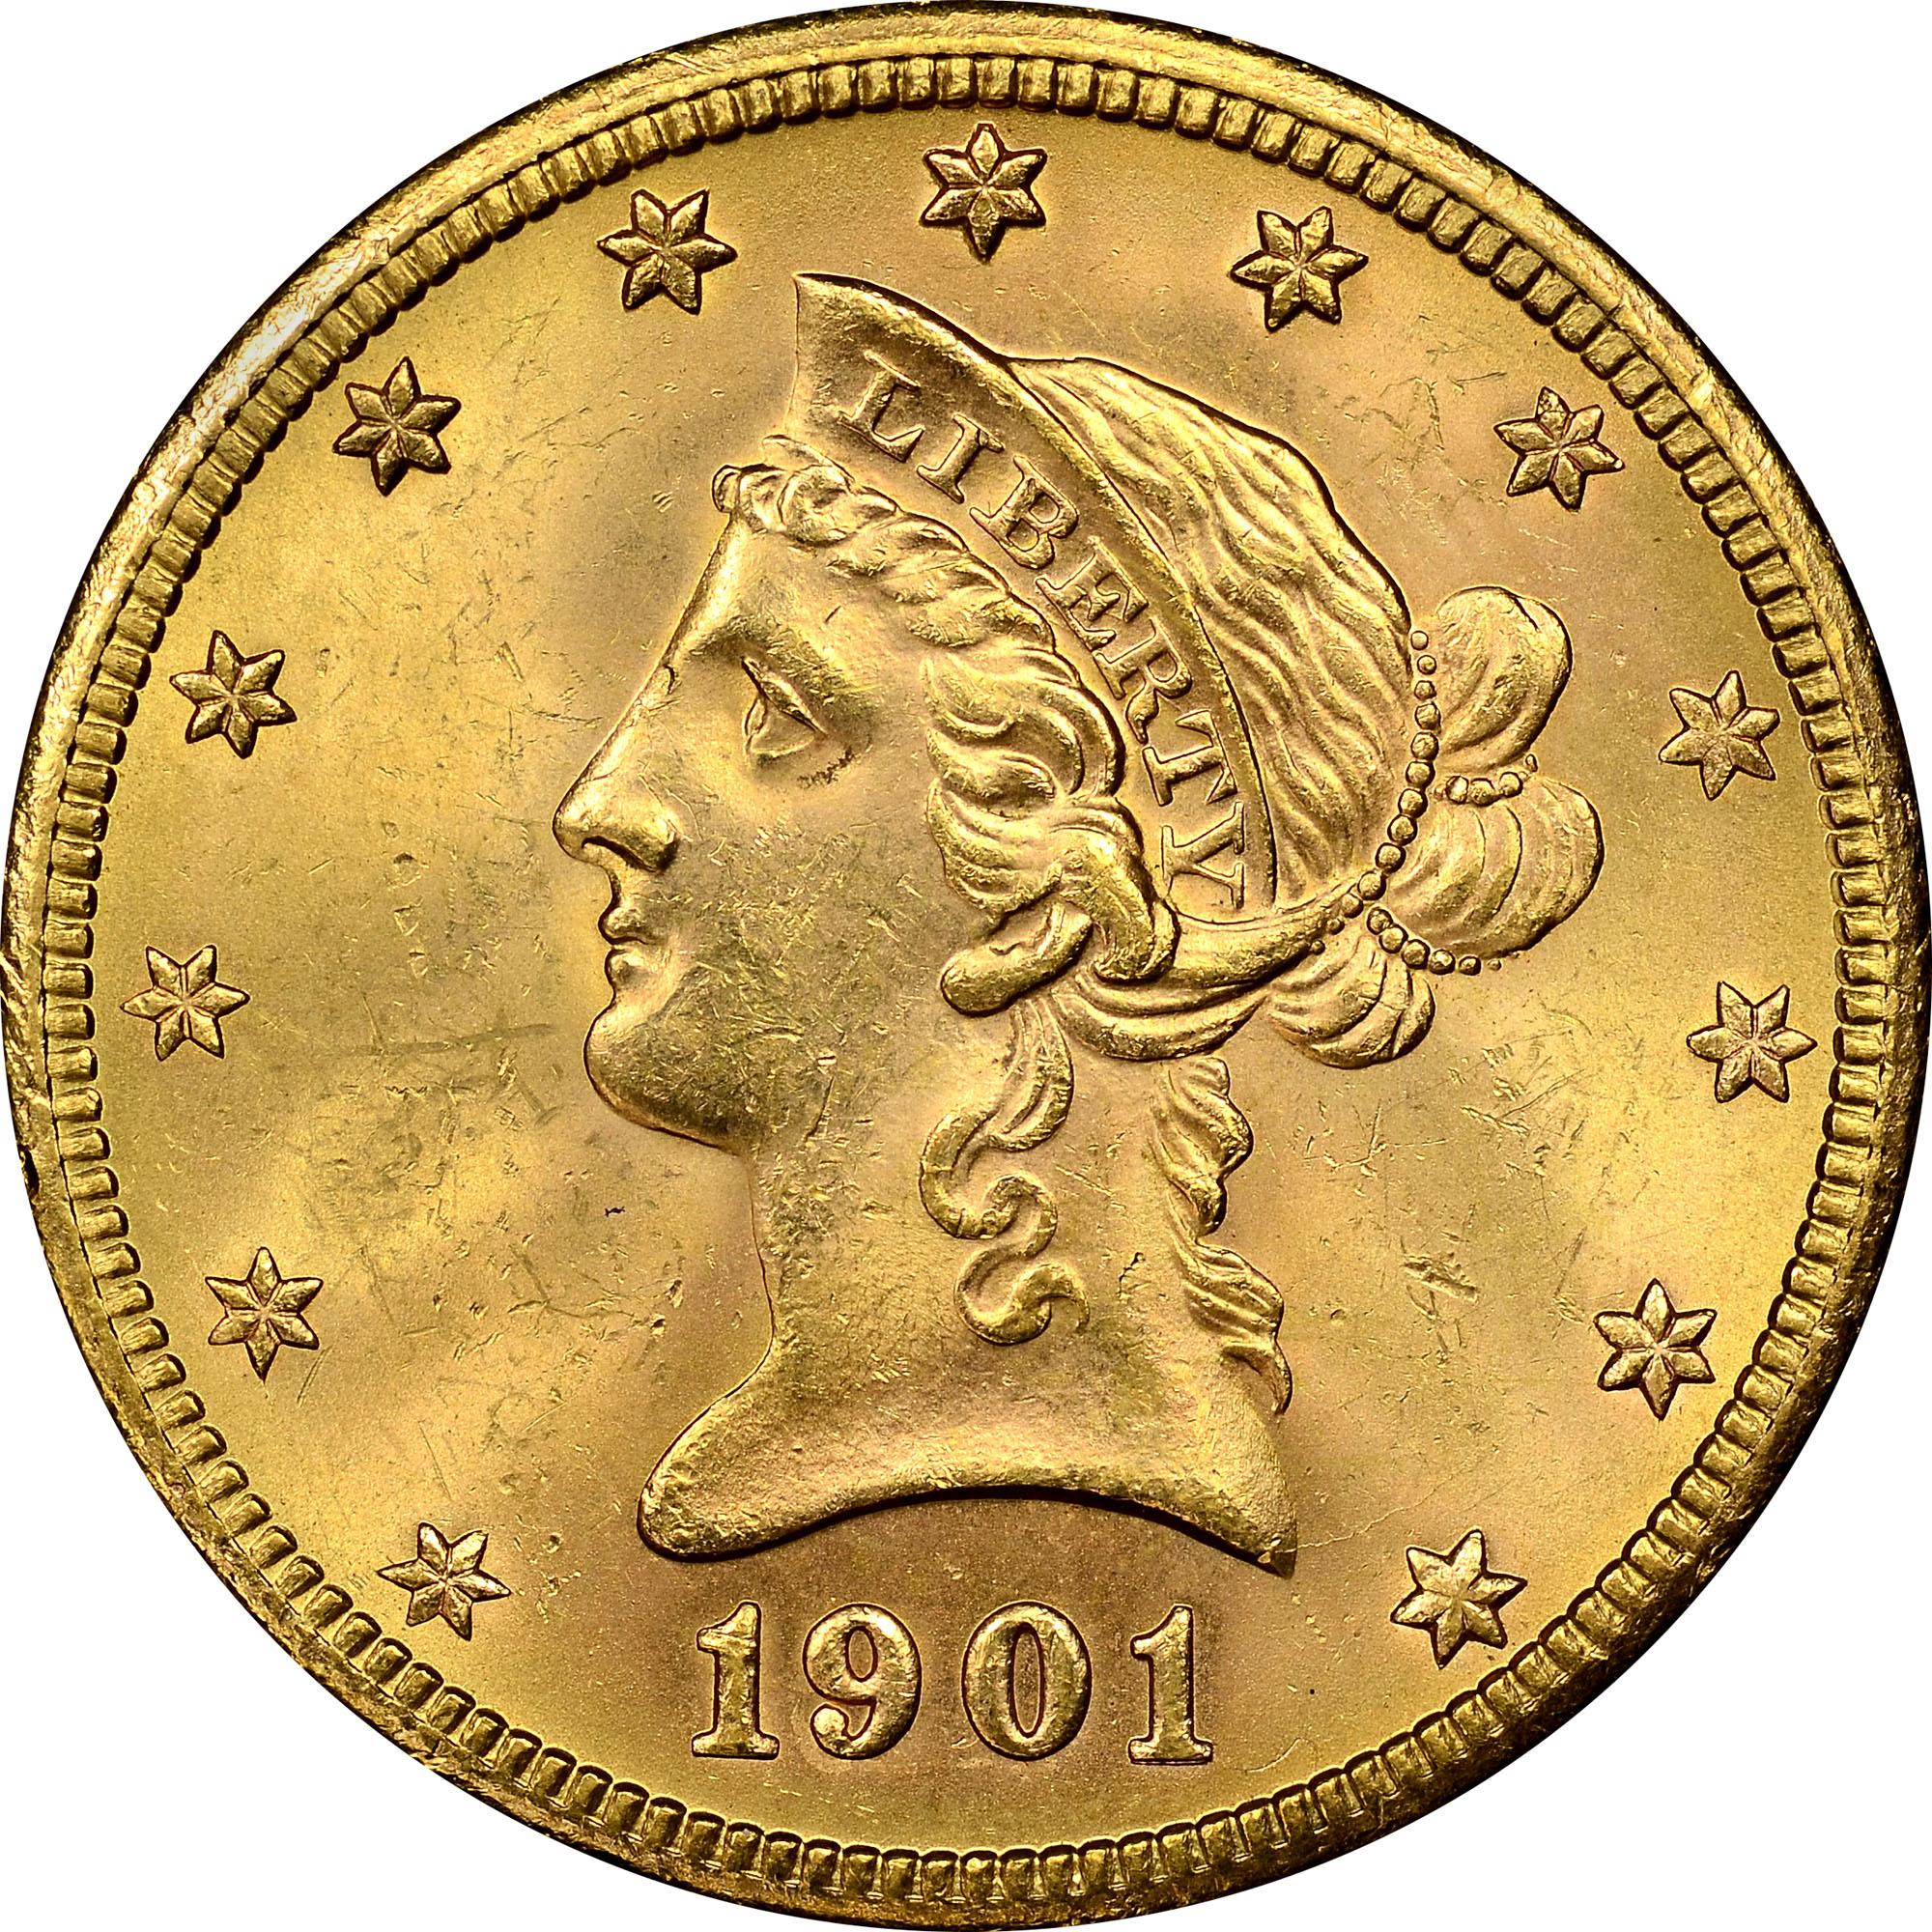 Citaten Geld Coin : S ms liberty head ngc